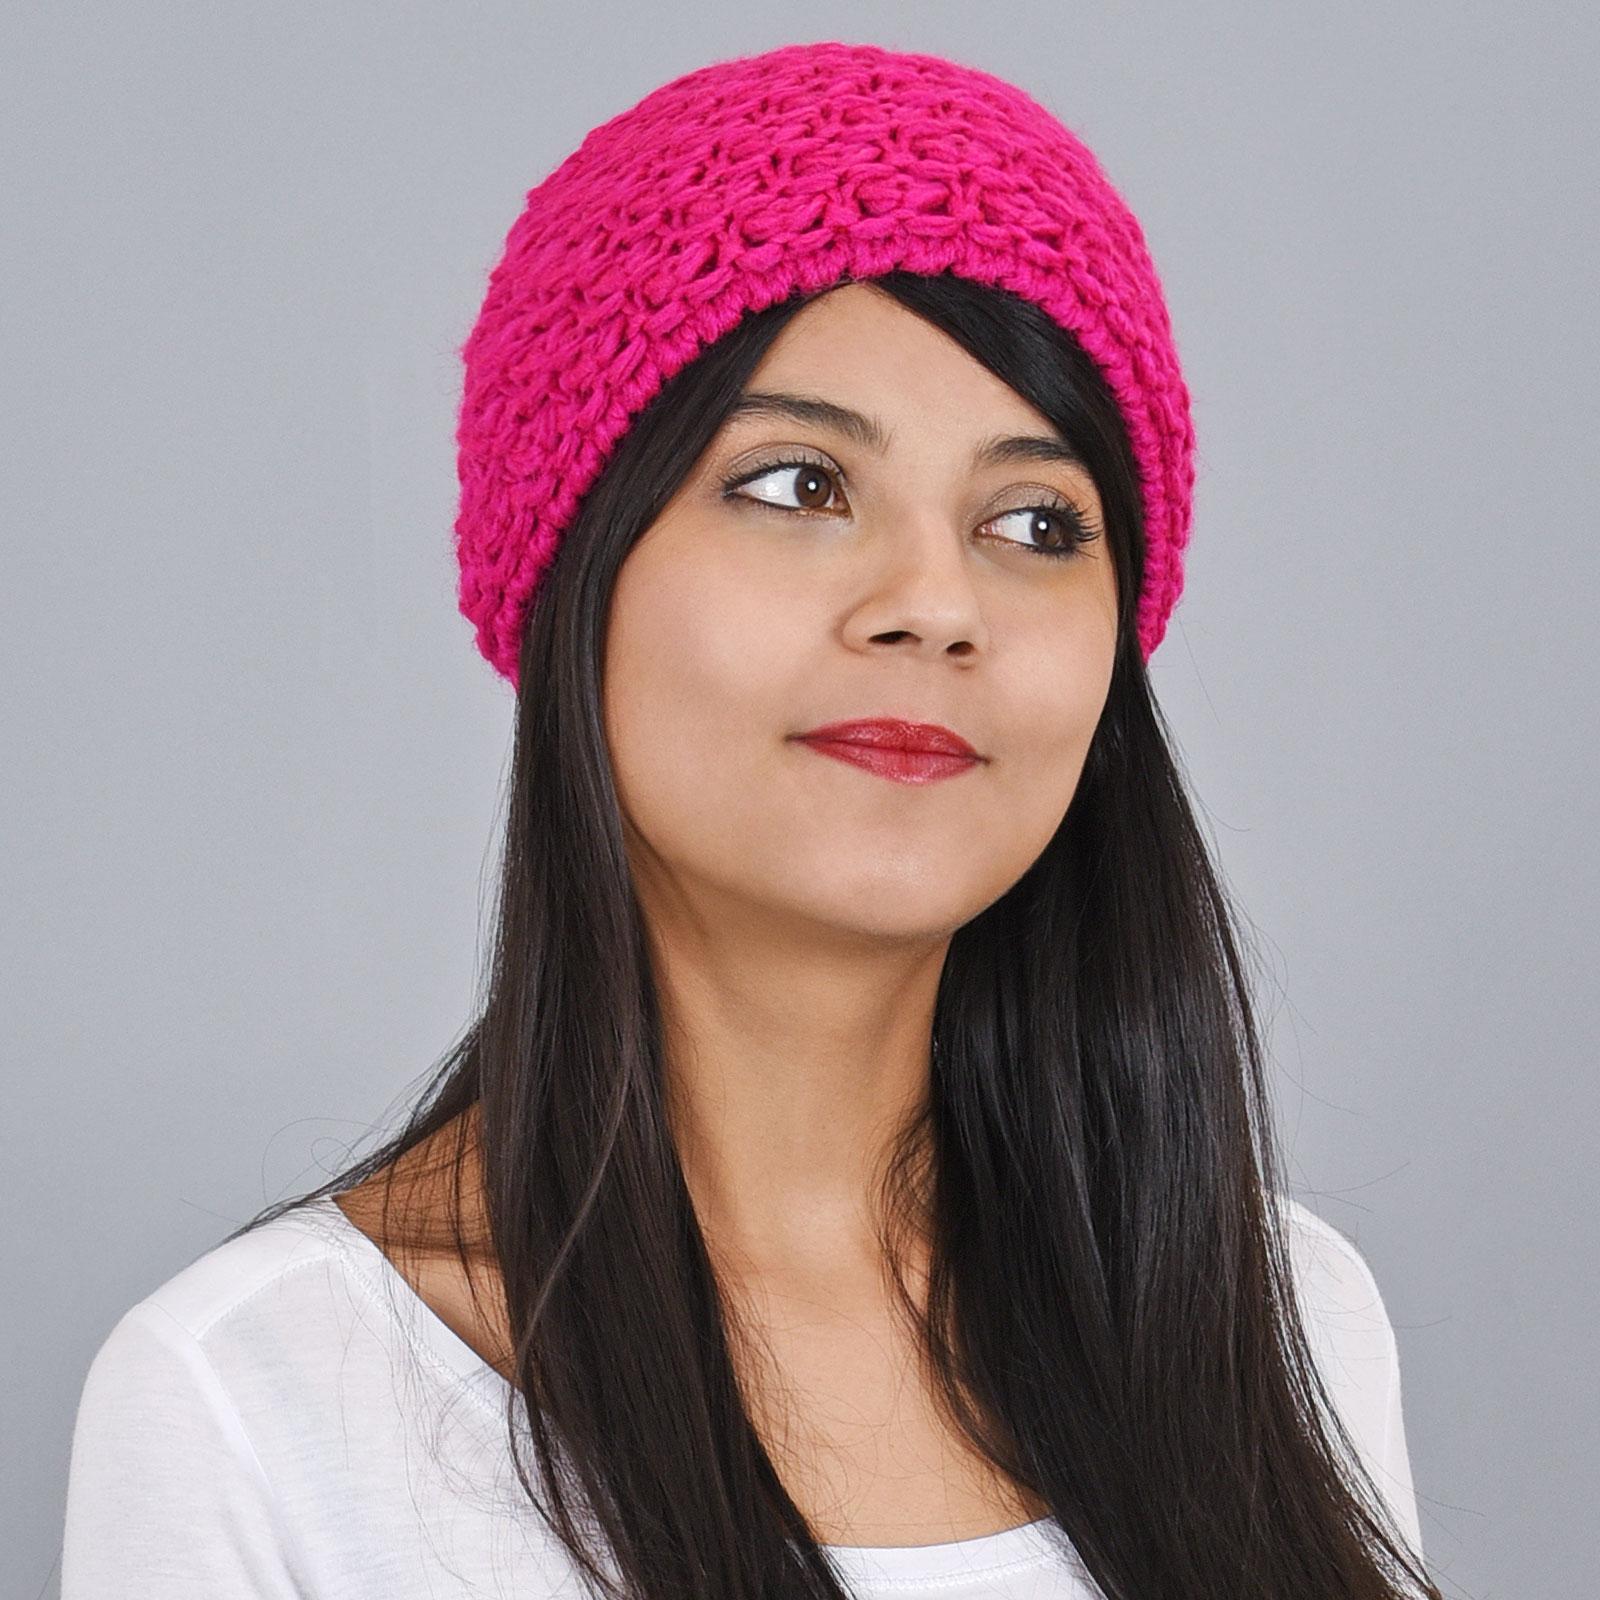 CP-00812-VF16-bonnet-court-femme-rose-fuchsia